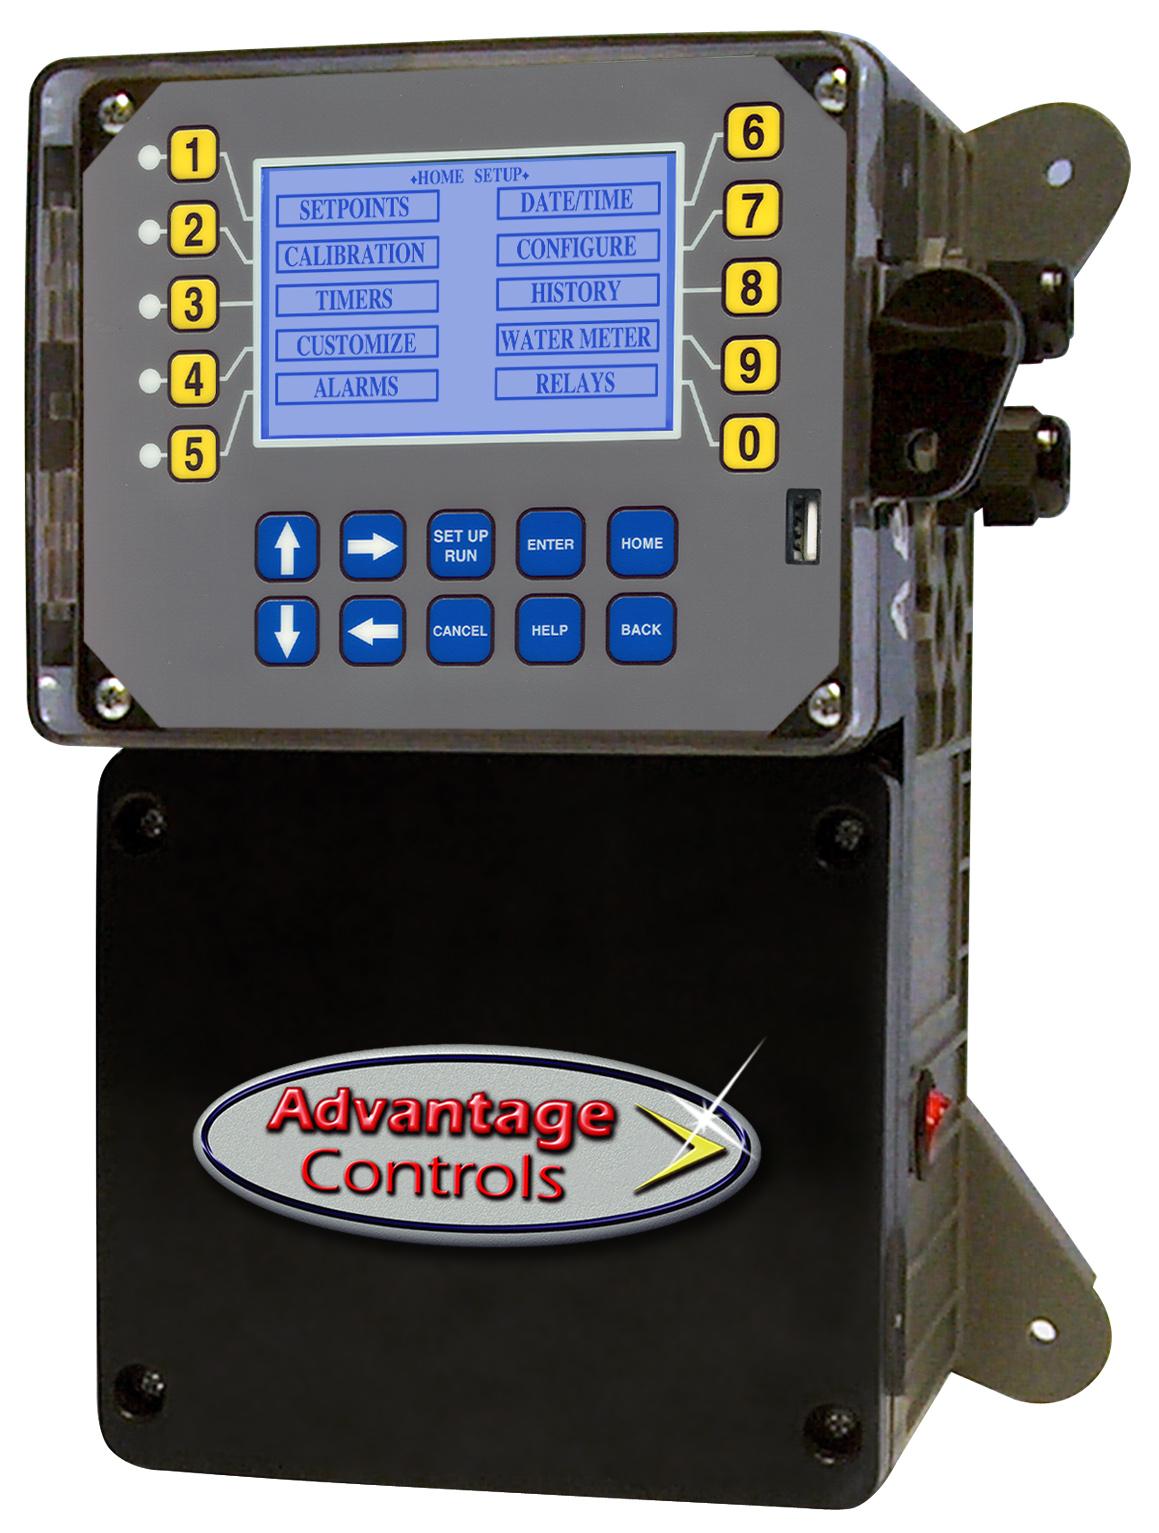 Advantage Controls Megatron Xs Industrial Water